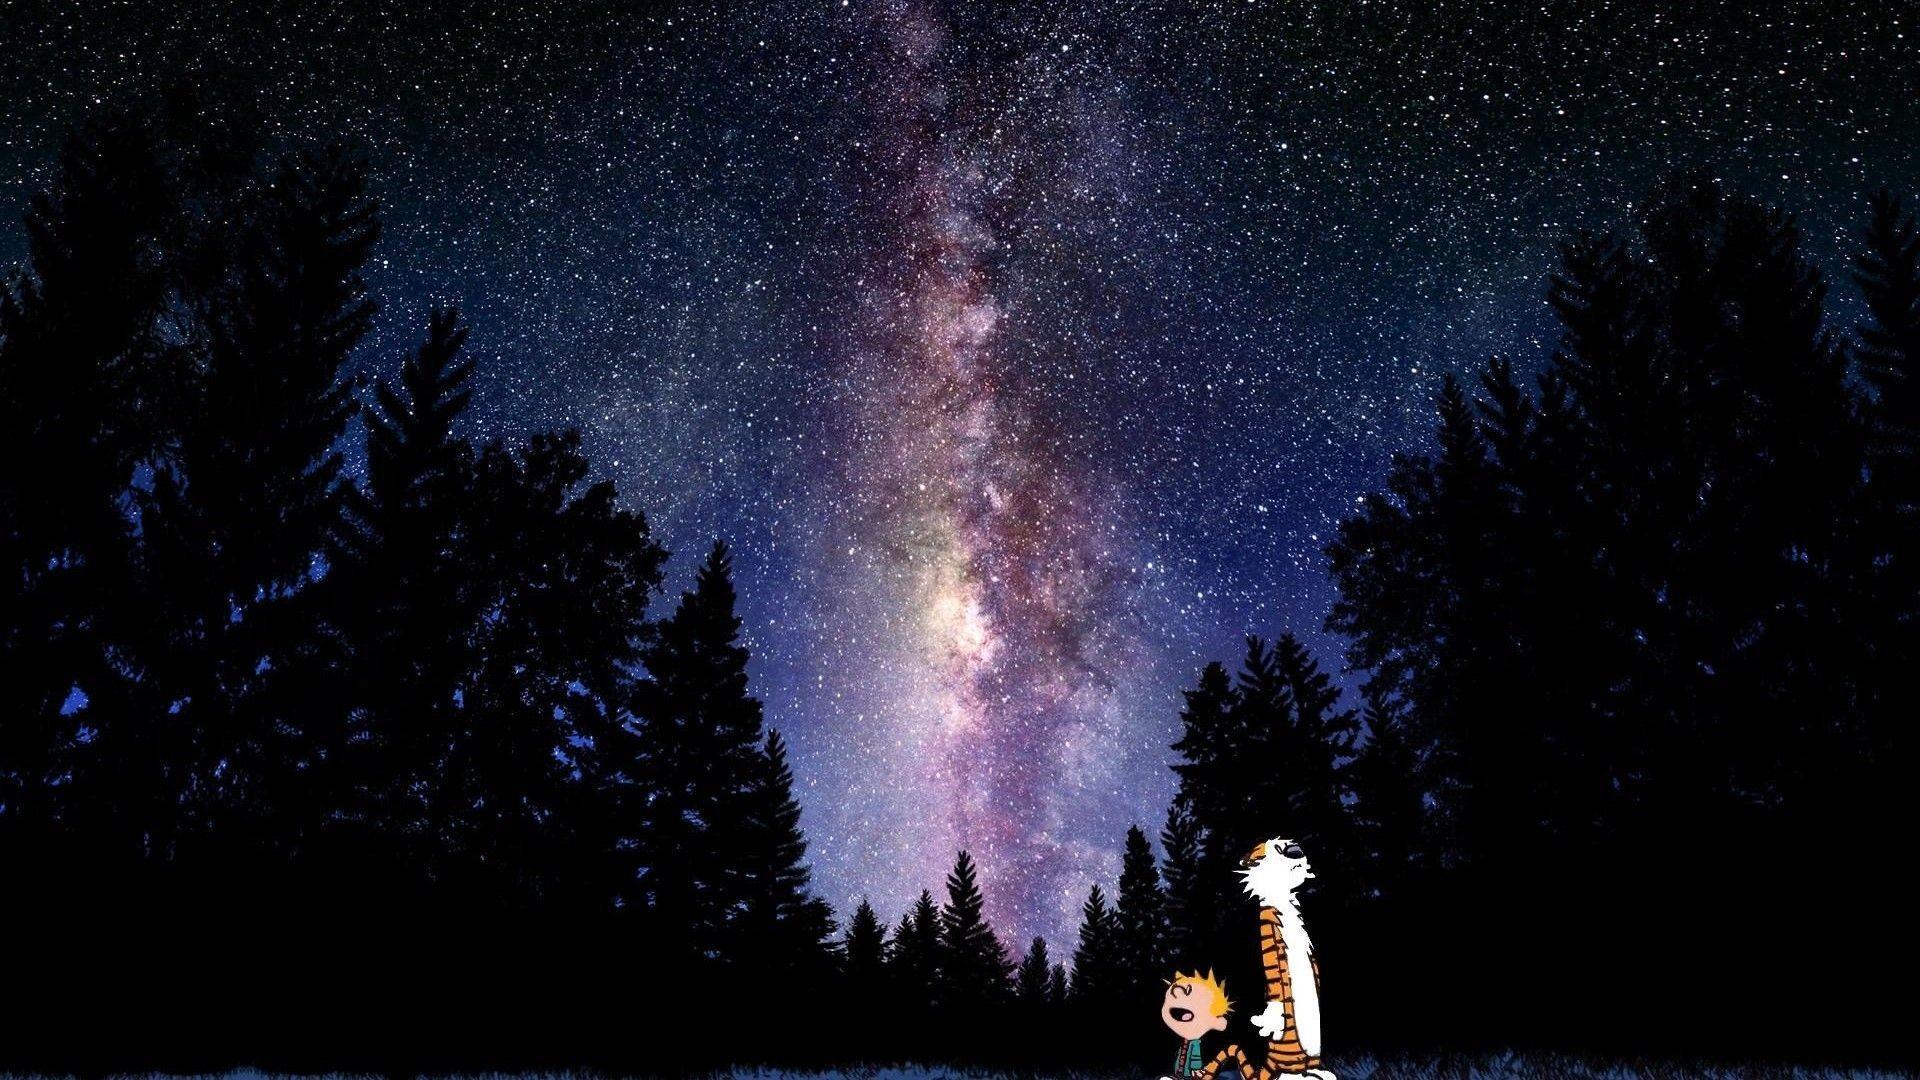 Calvin and hobbes comics sky stars mood sci-fi g wallpaper .